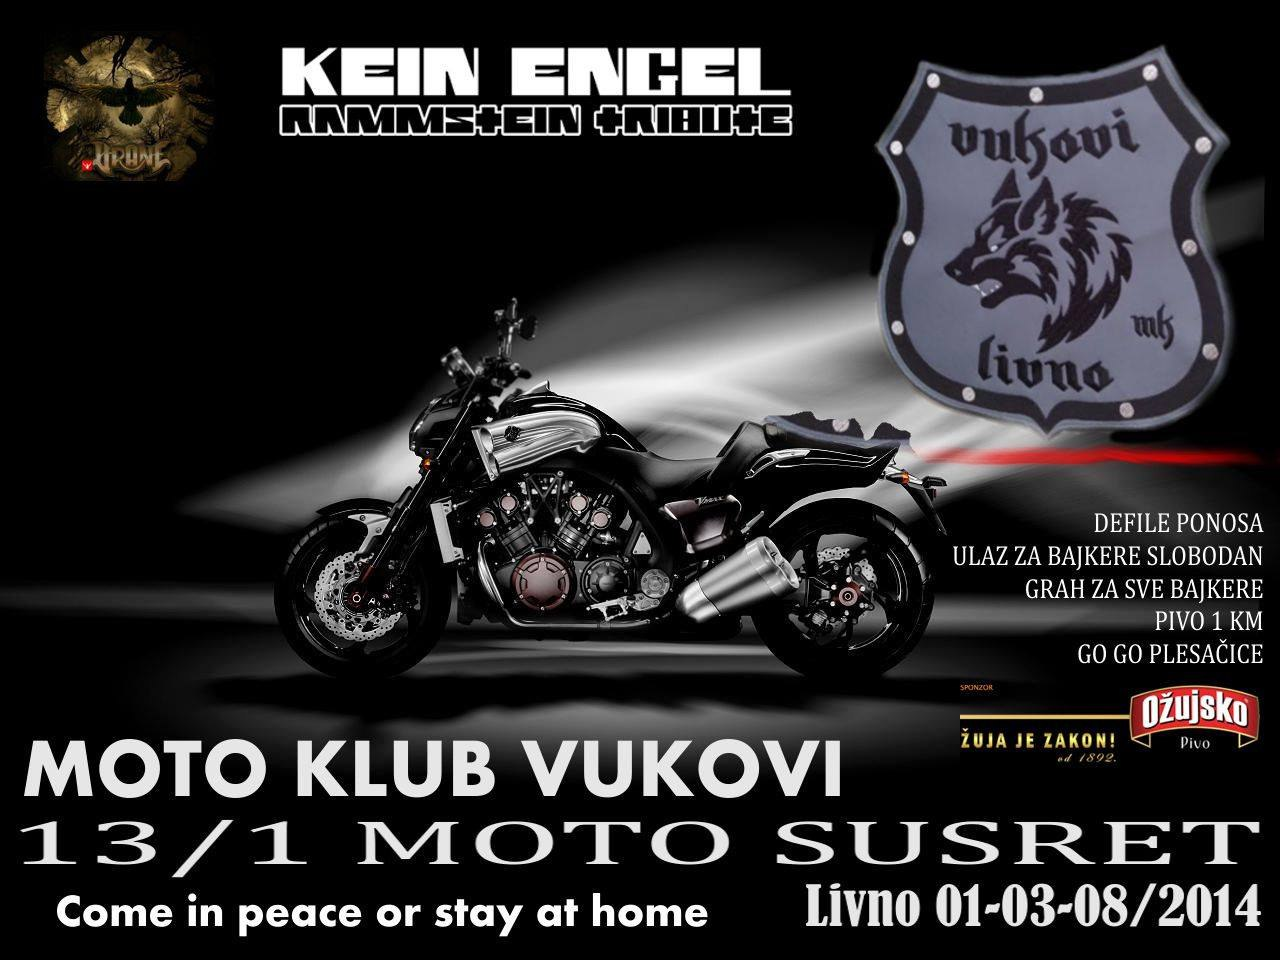 Kein Engel @ MK Vukovi Livno Moto Party 2014